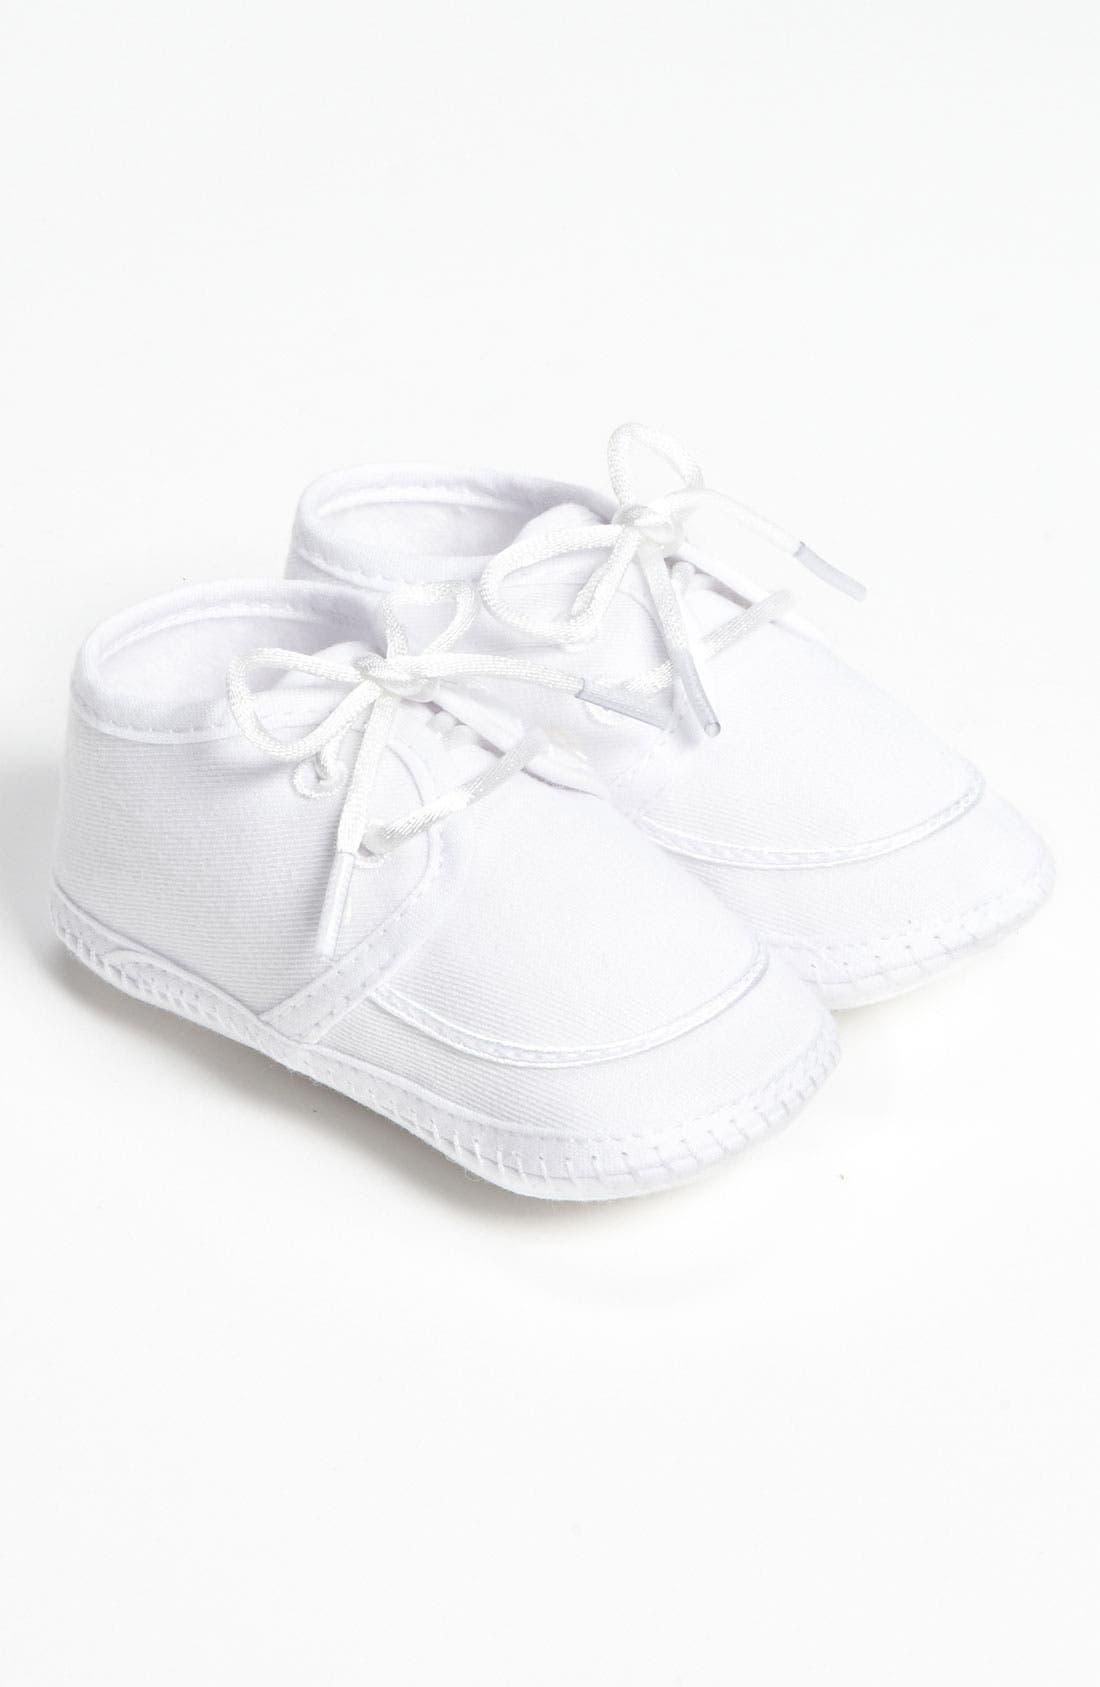 LITTLE THINGS MEAN A LOT Gabardine Shoe, Main, color, 100